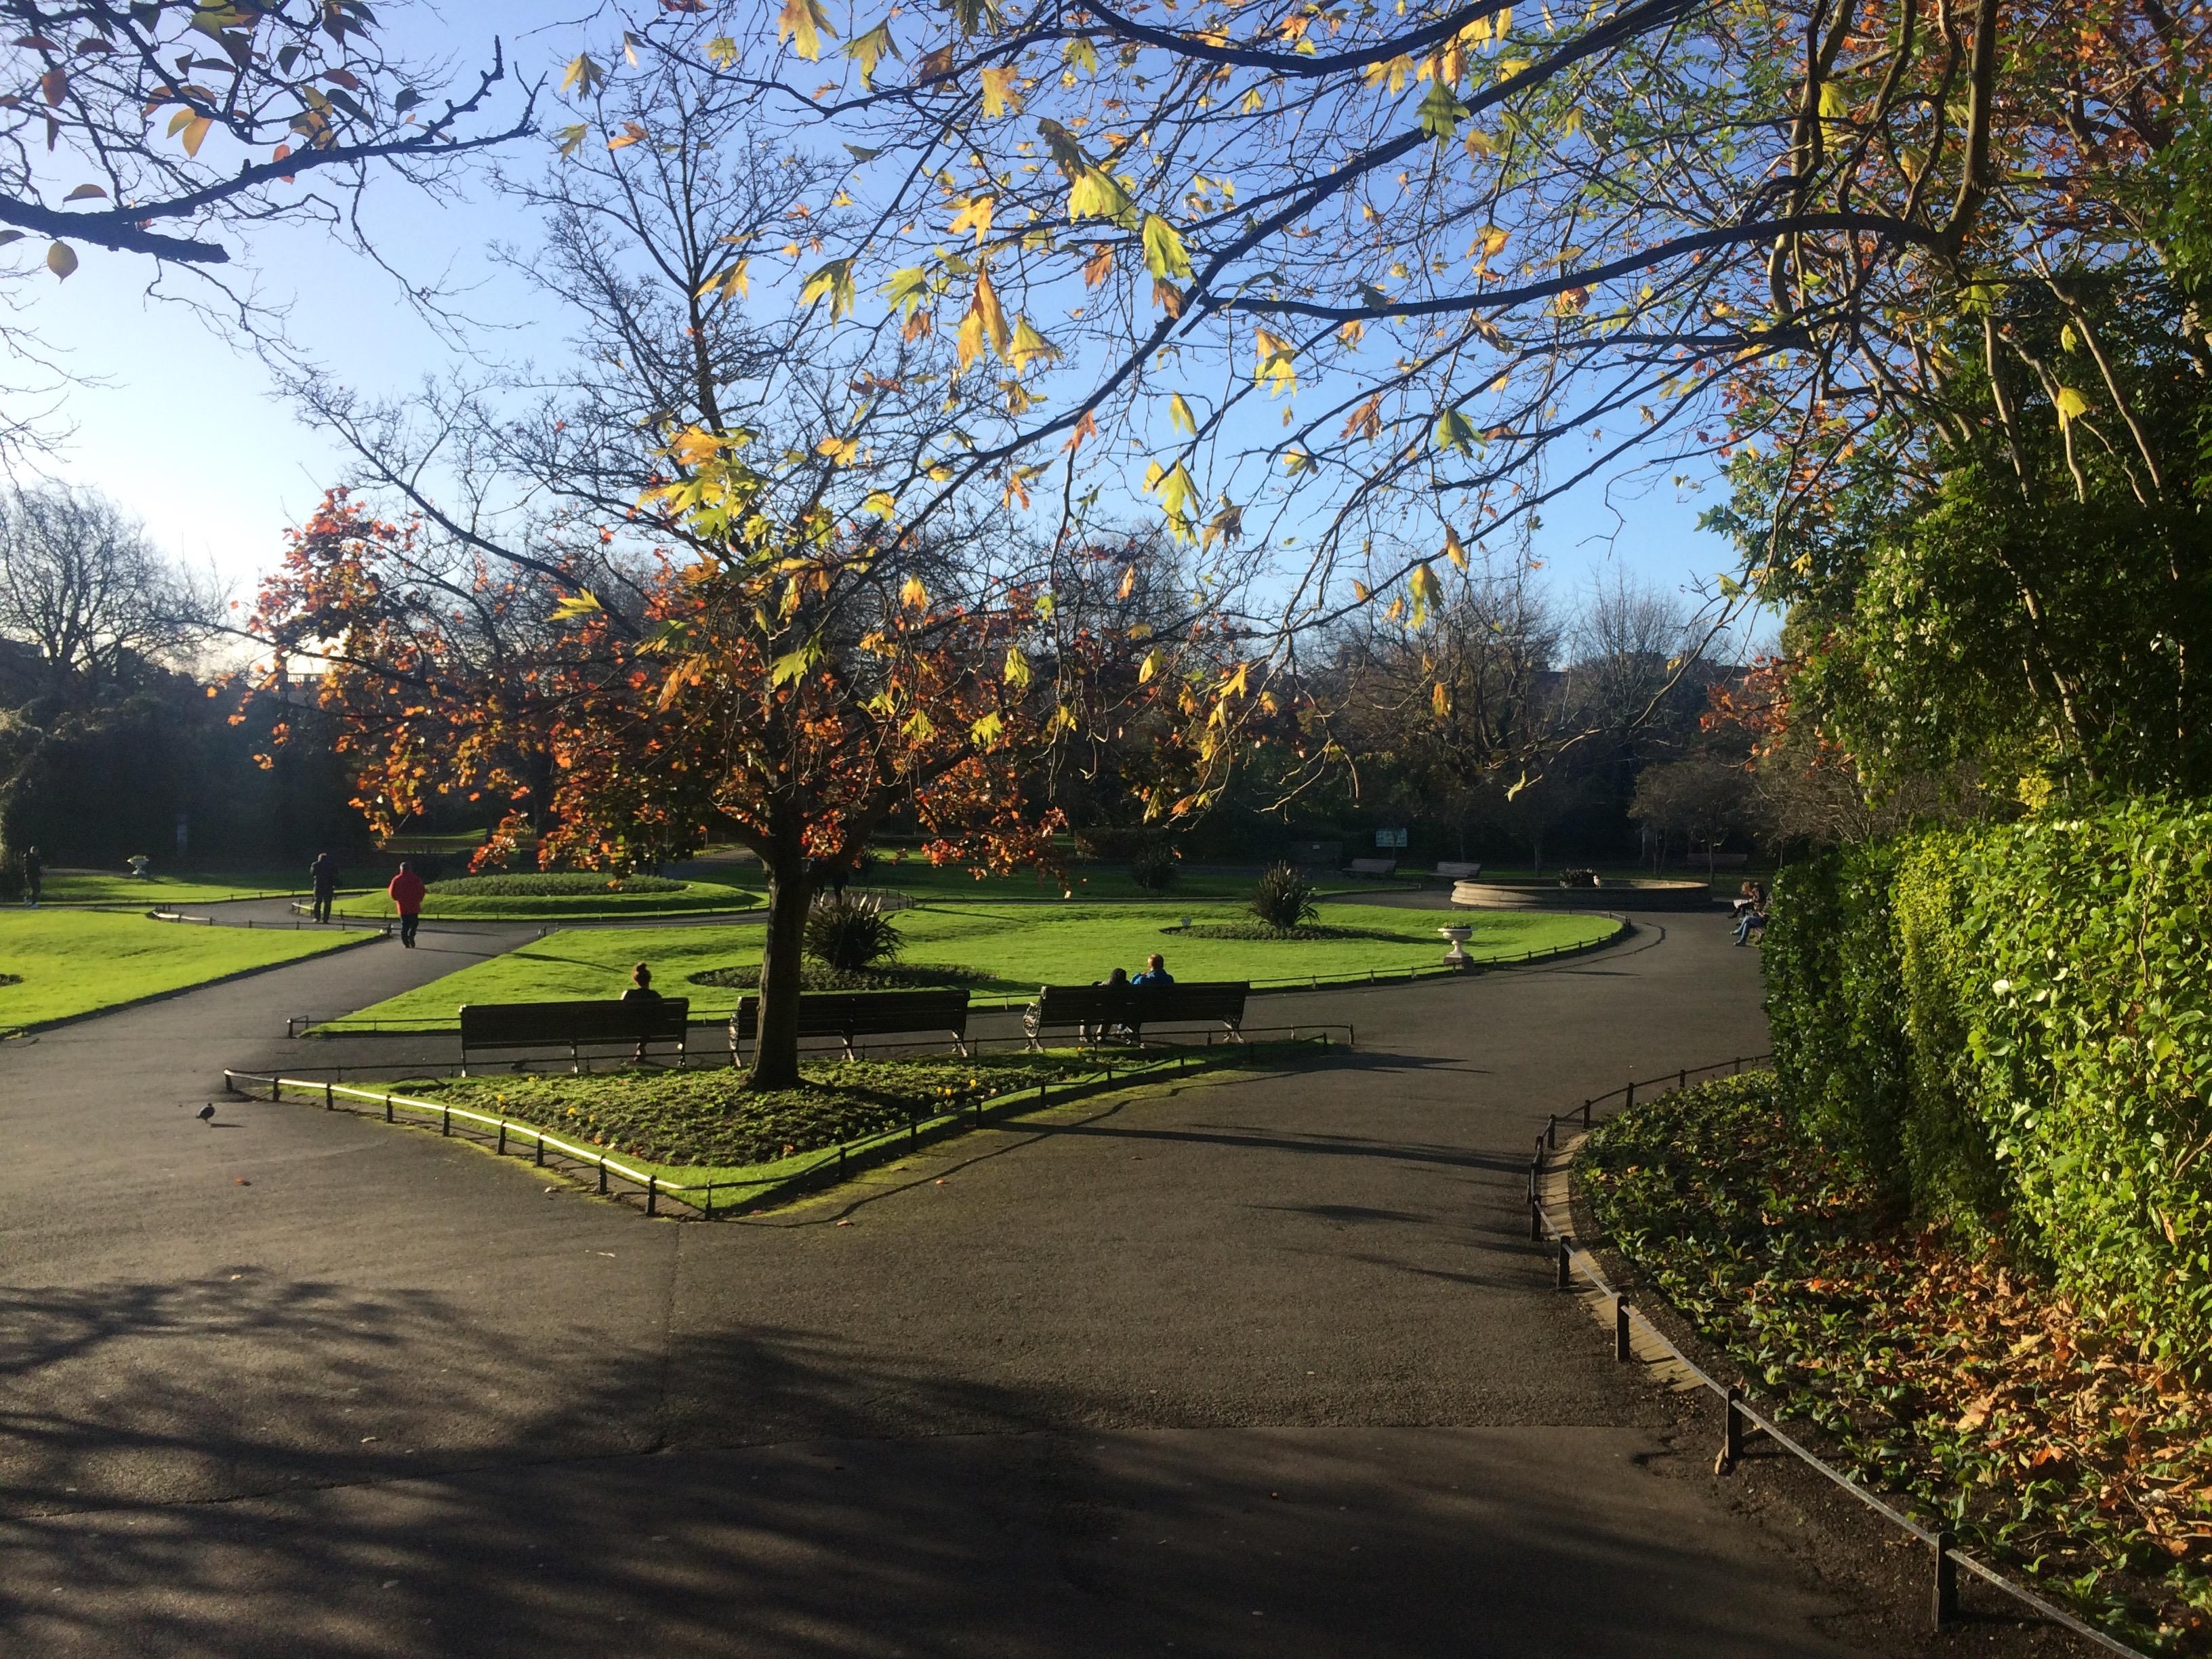 A view inside Saint Stephen's Green Park in Dublin, Ireland.